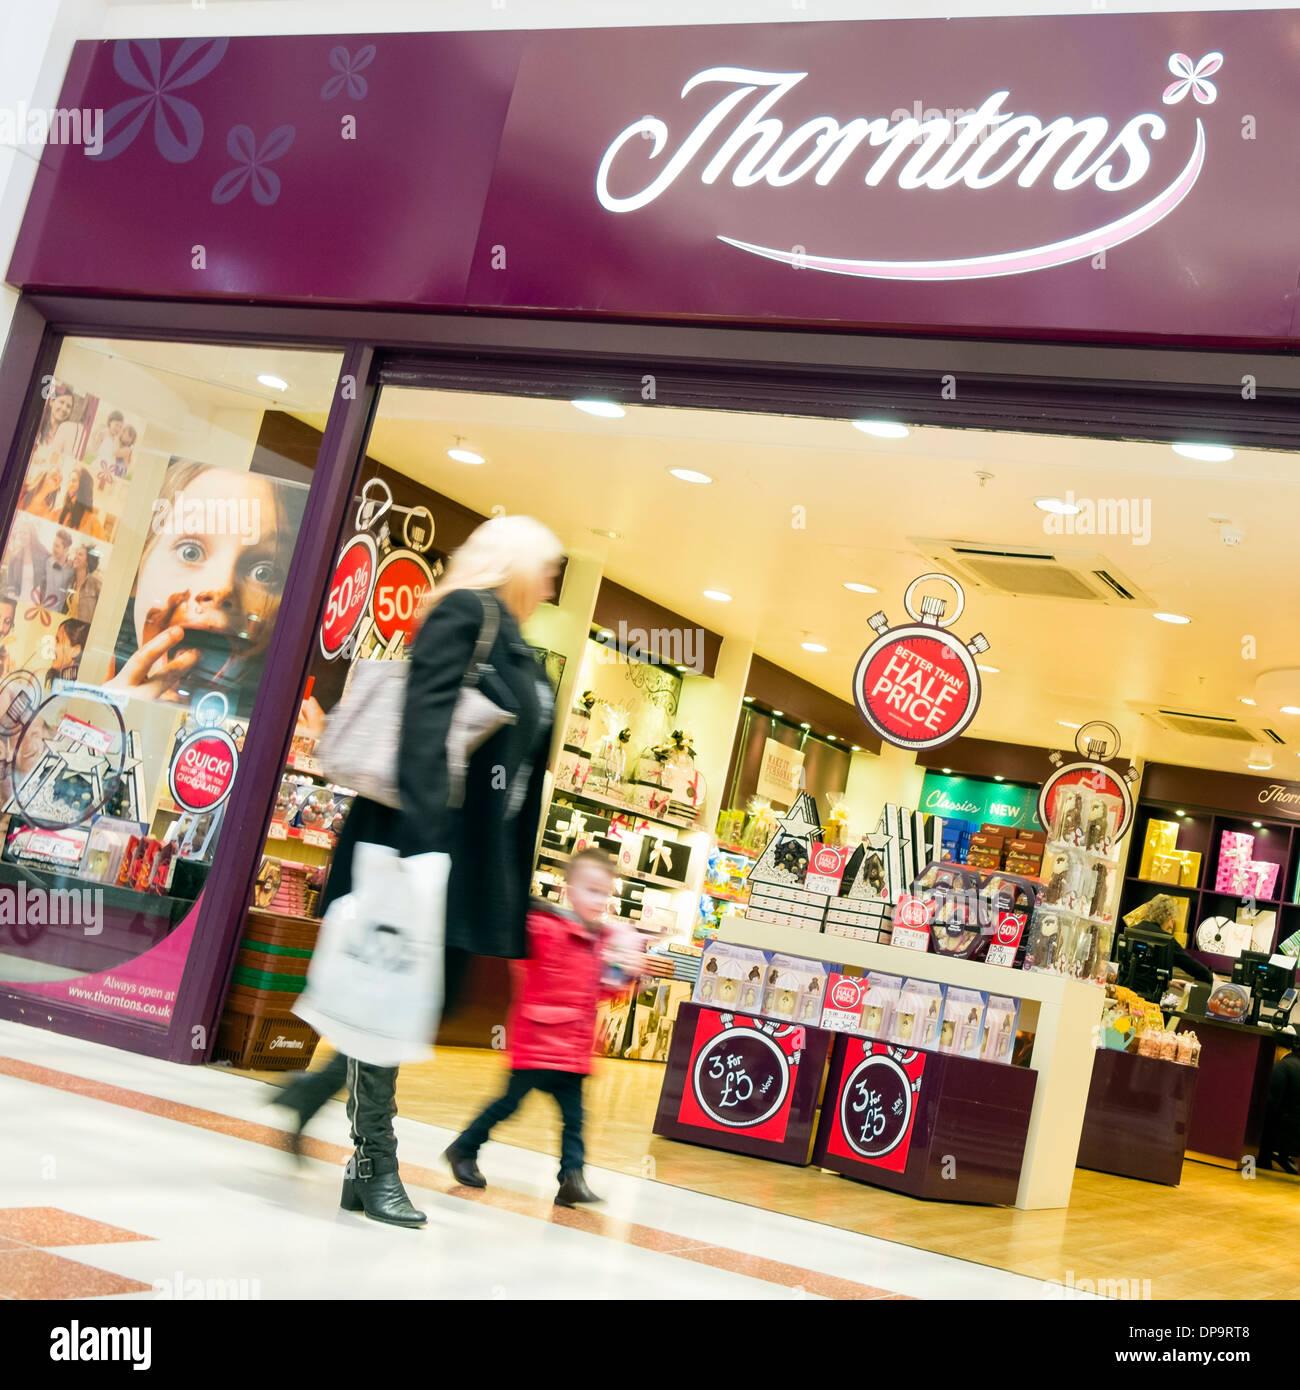 Thorntons Chocolate Store Stock Photos Thorntons Chocolate